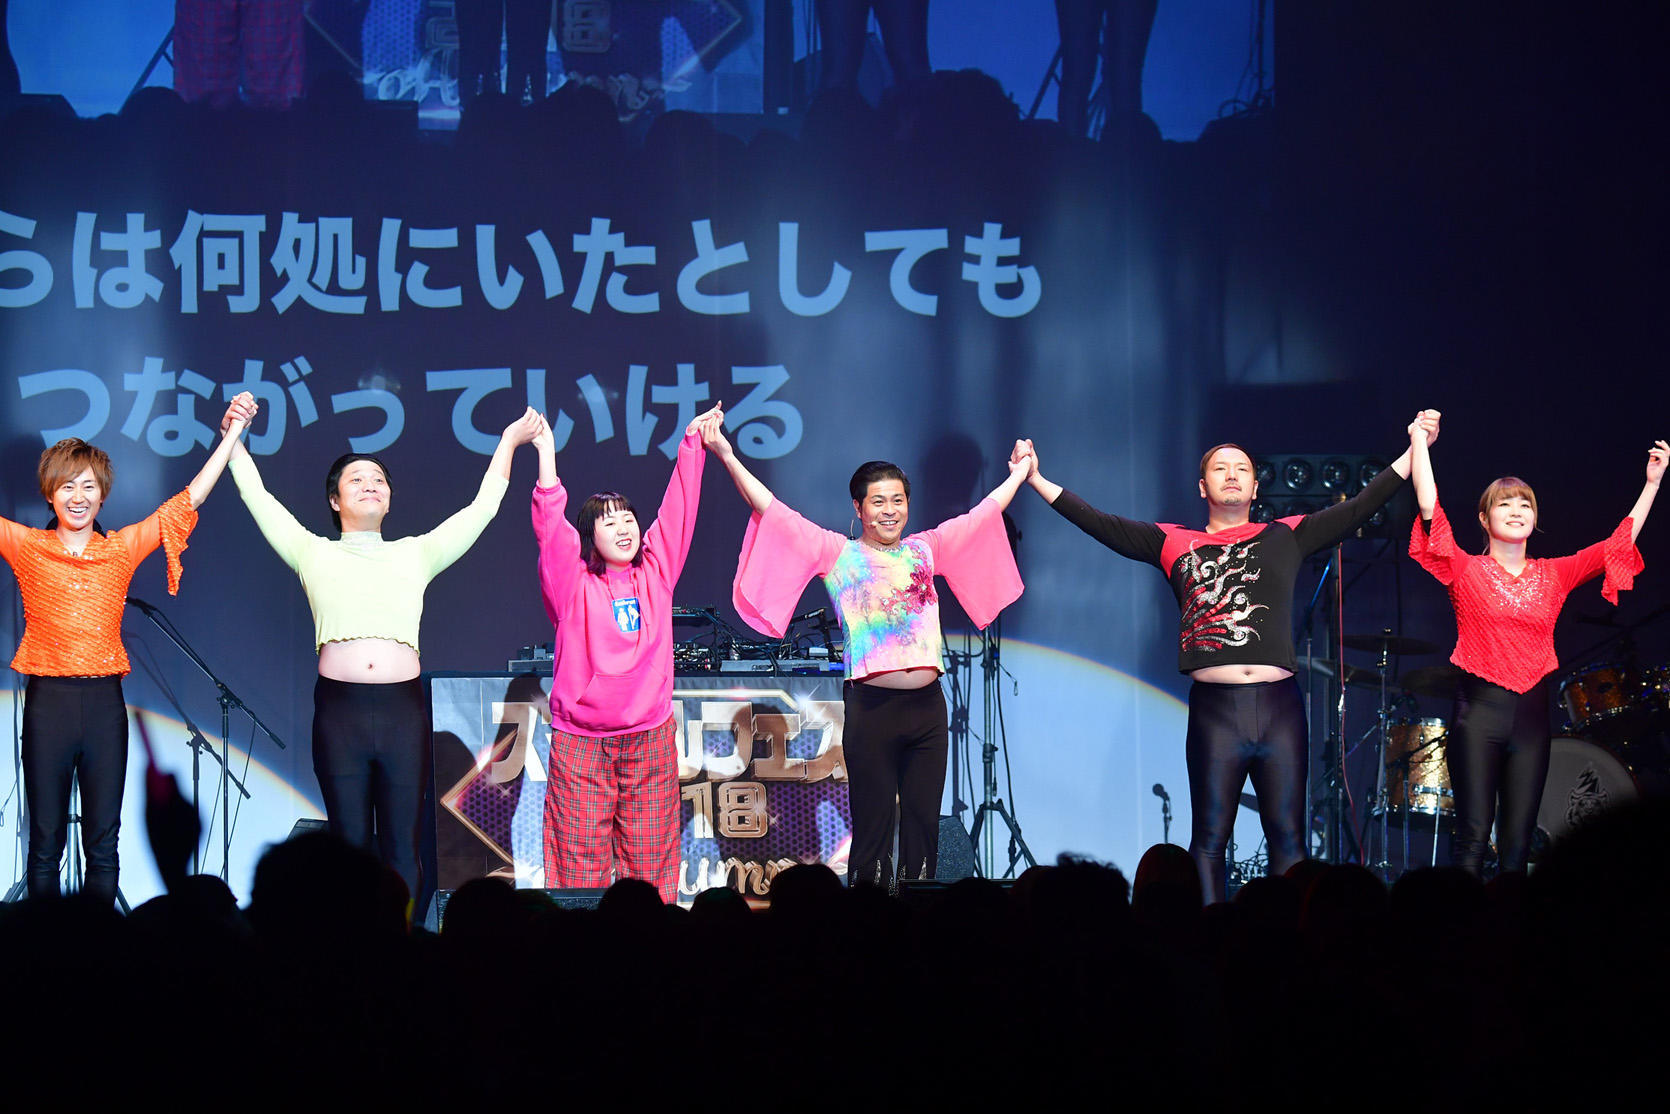 http://news.yoshimoto.co.jp/20181201025442-c3f59961d5ef6ce4341fb83d1fd18ba34a7cc4f2.jpg